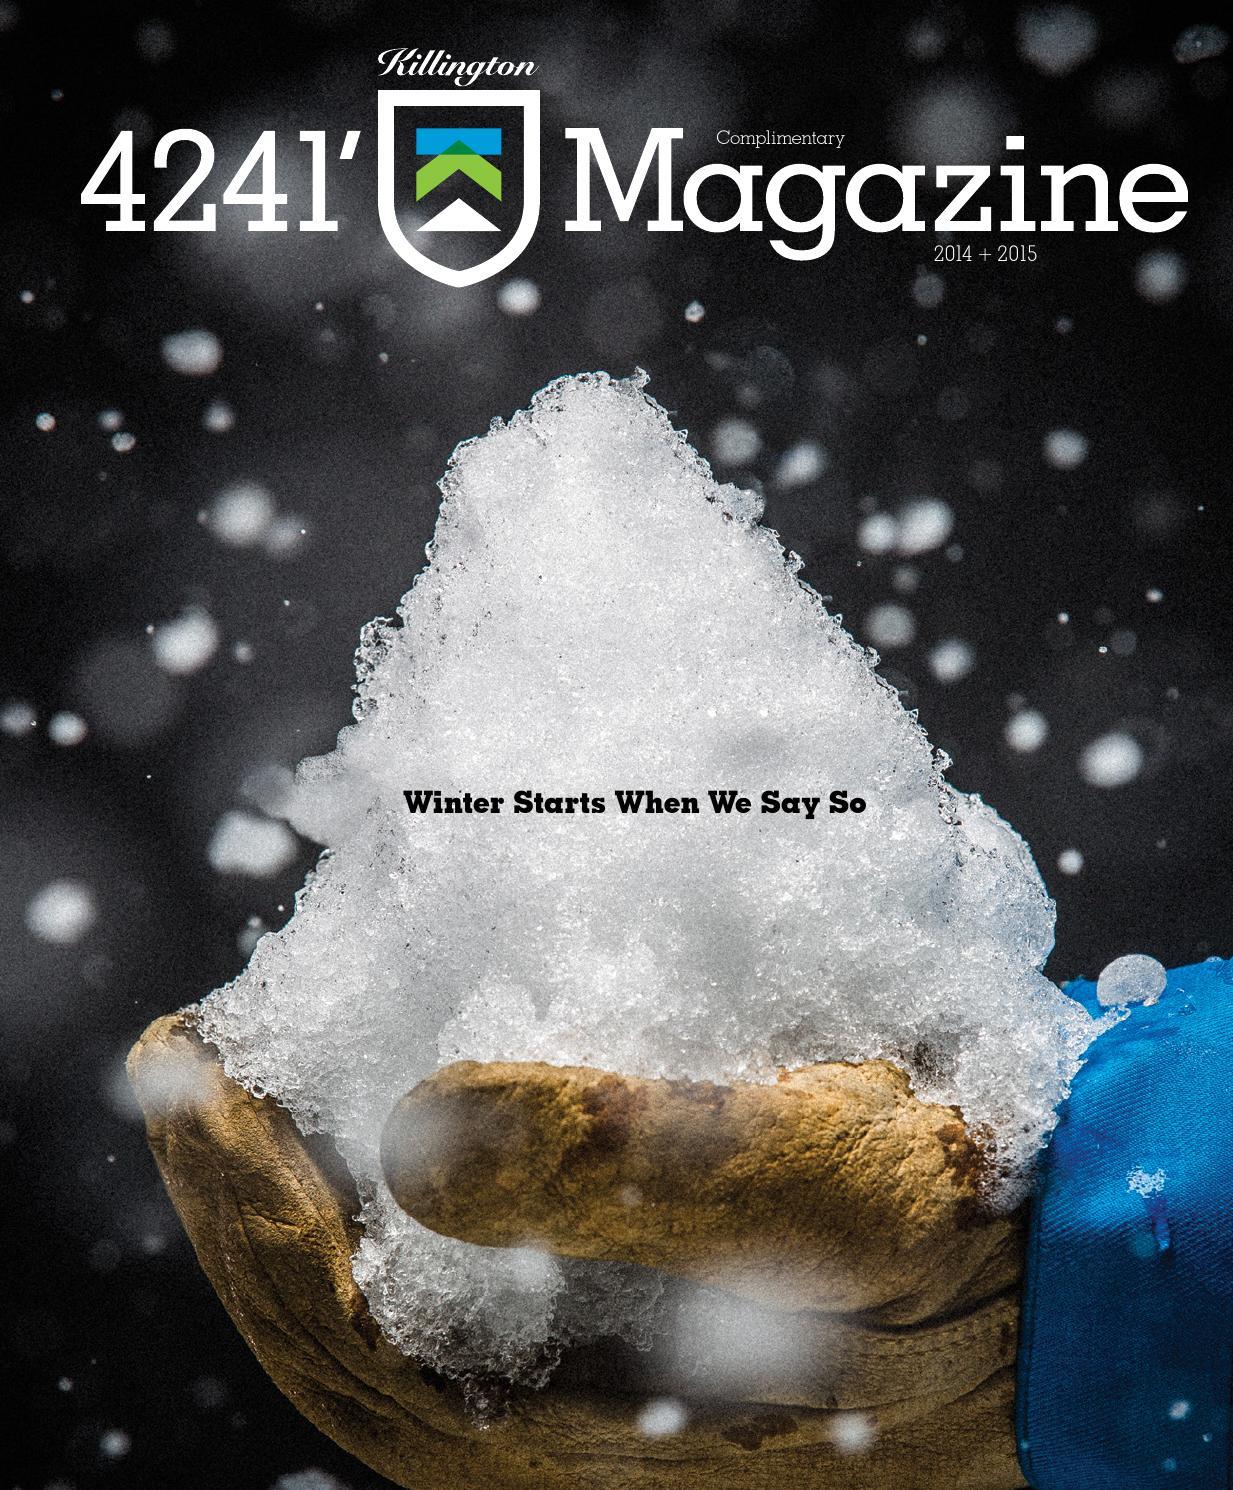 4241  Killington Magazine by Killington Resort - issuu db834b81a50